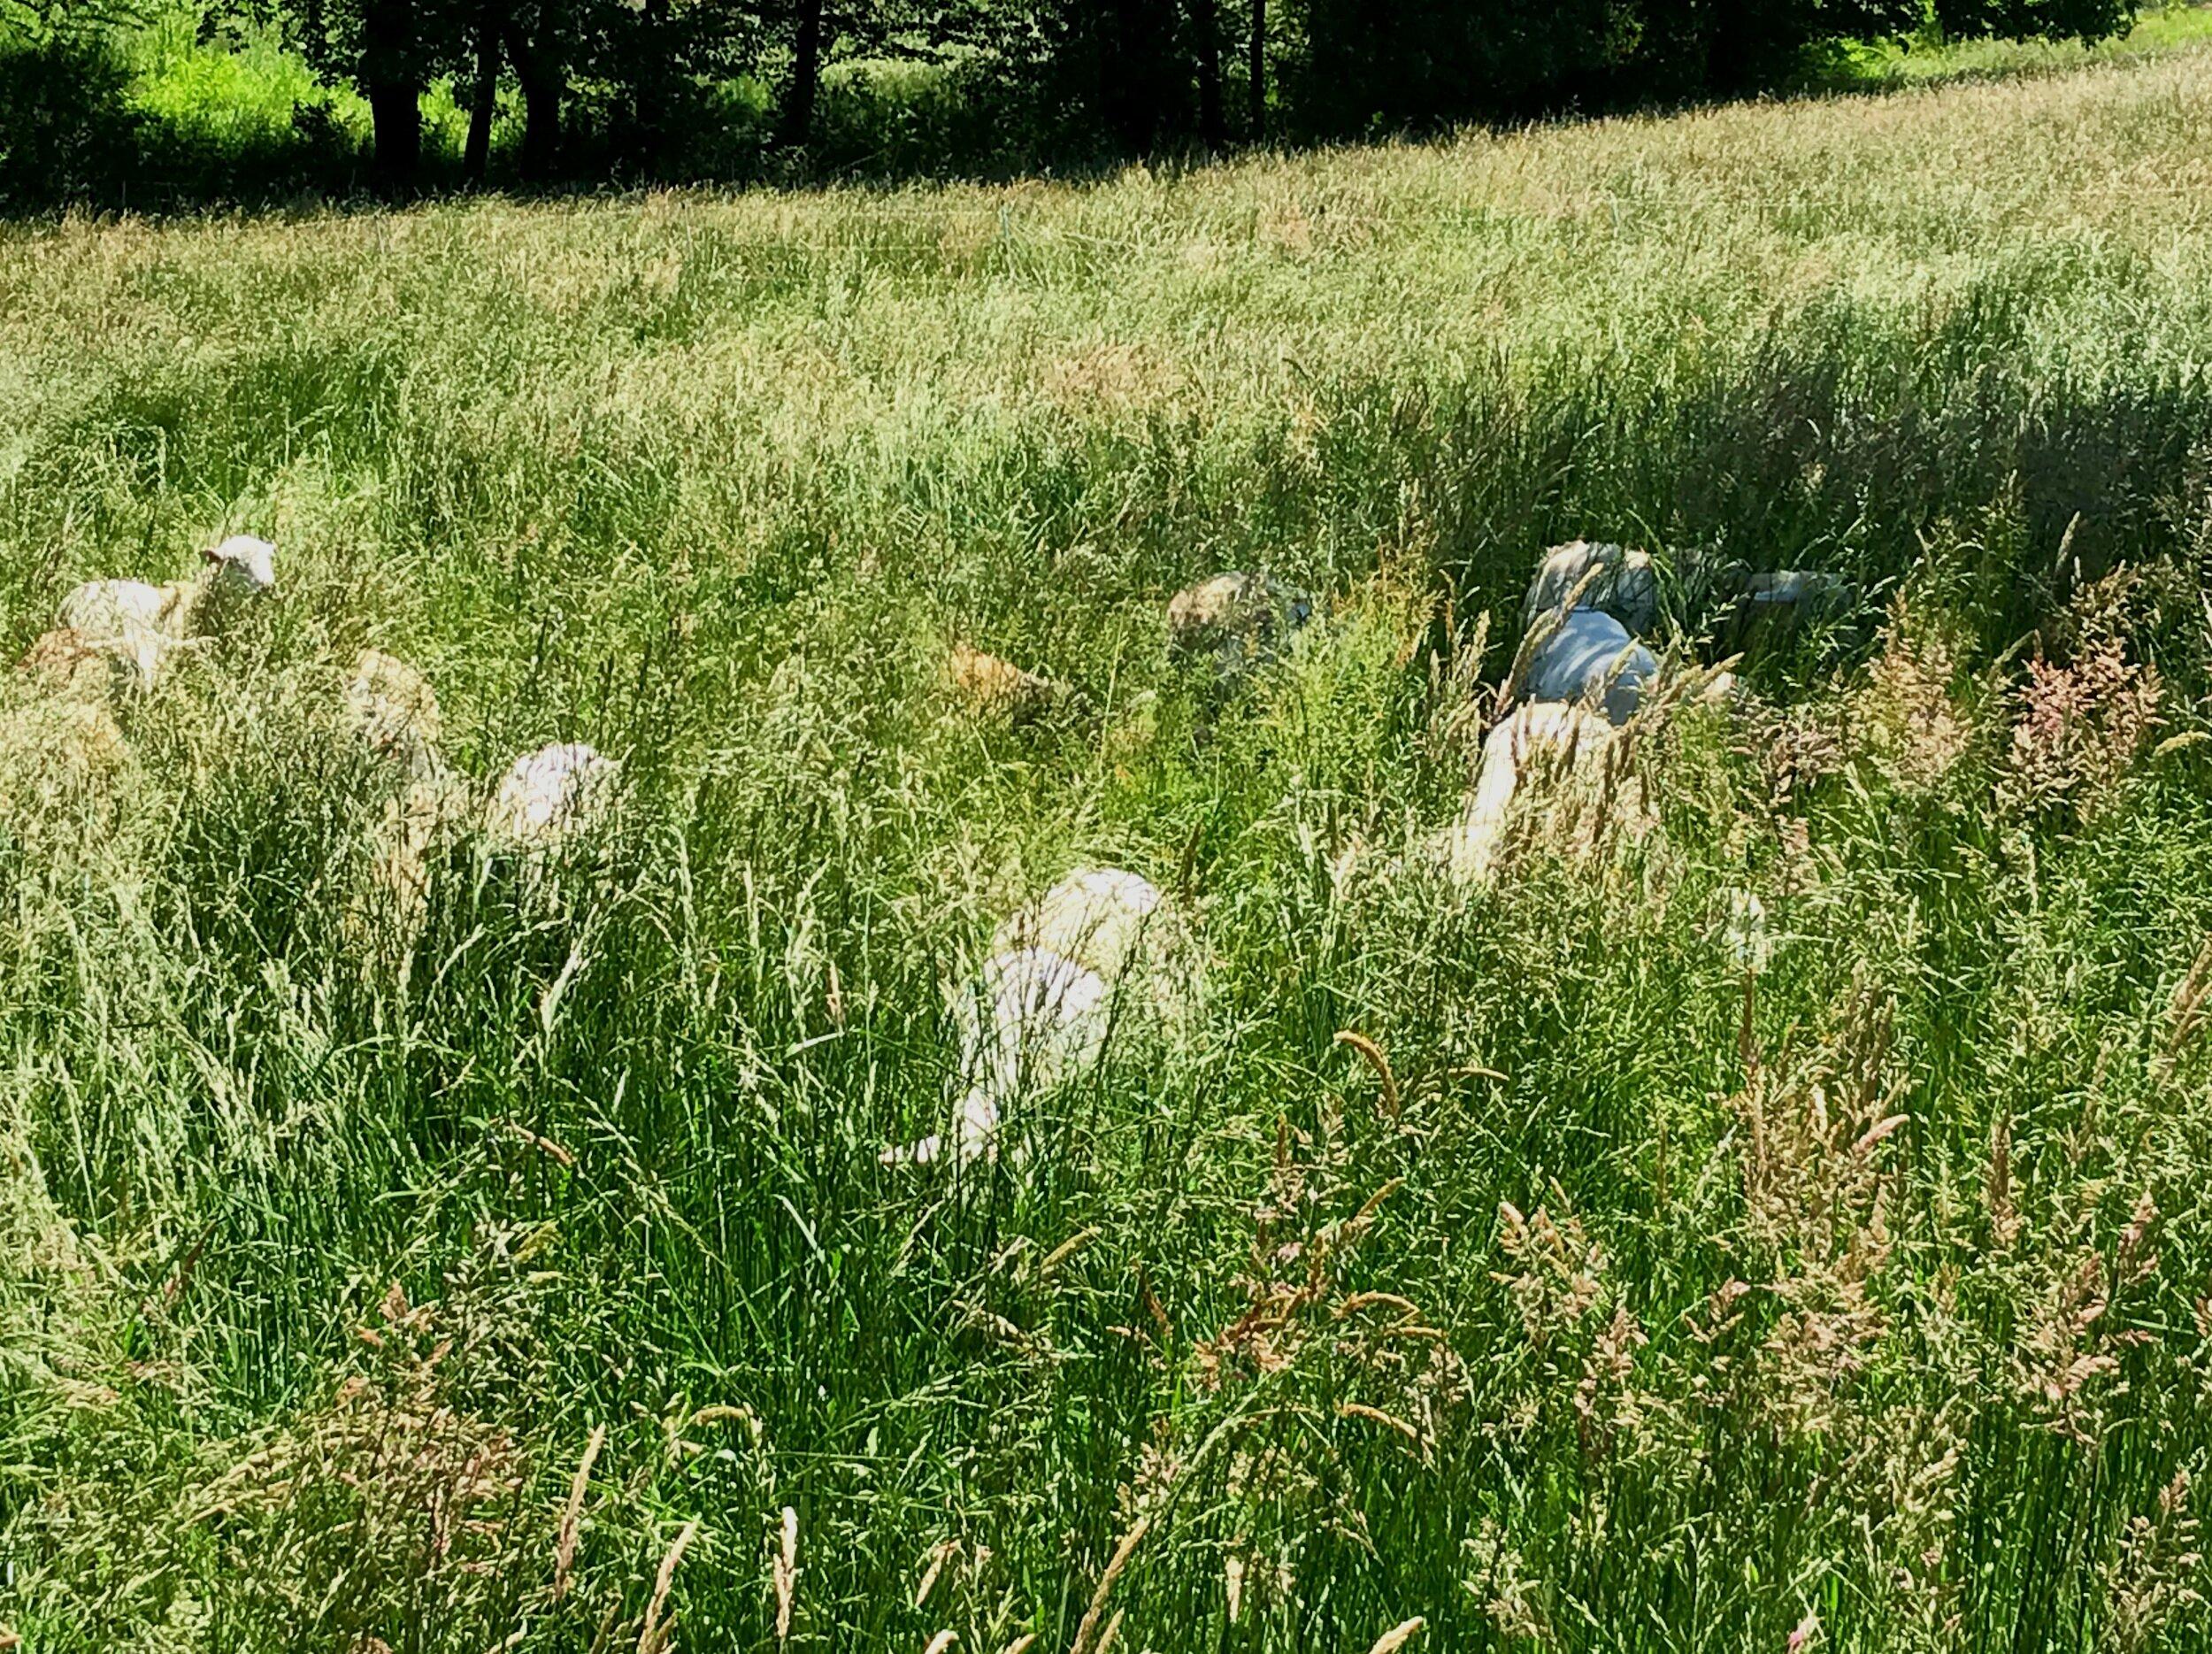 sheep+in+grass.jpg